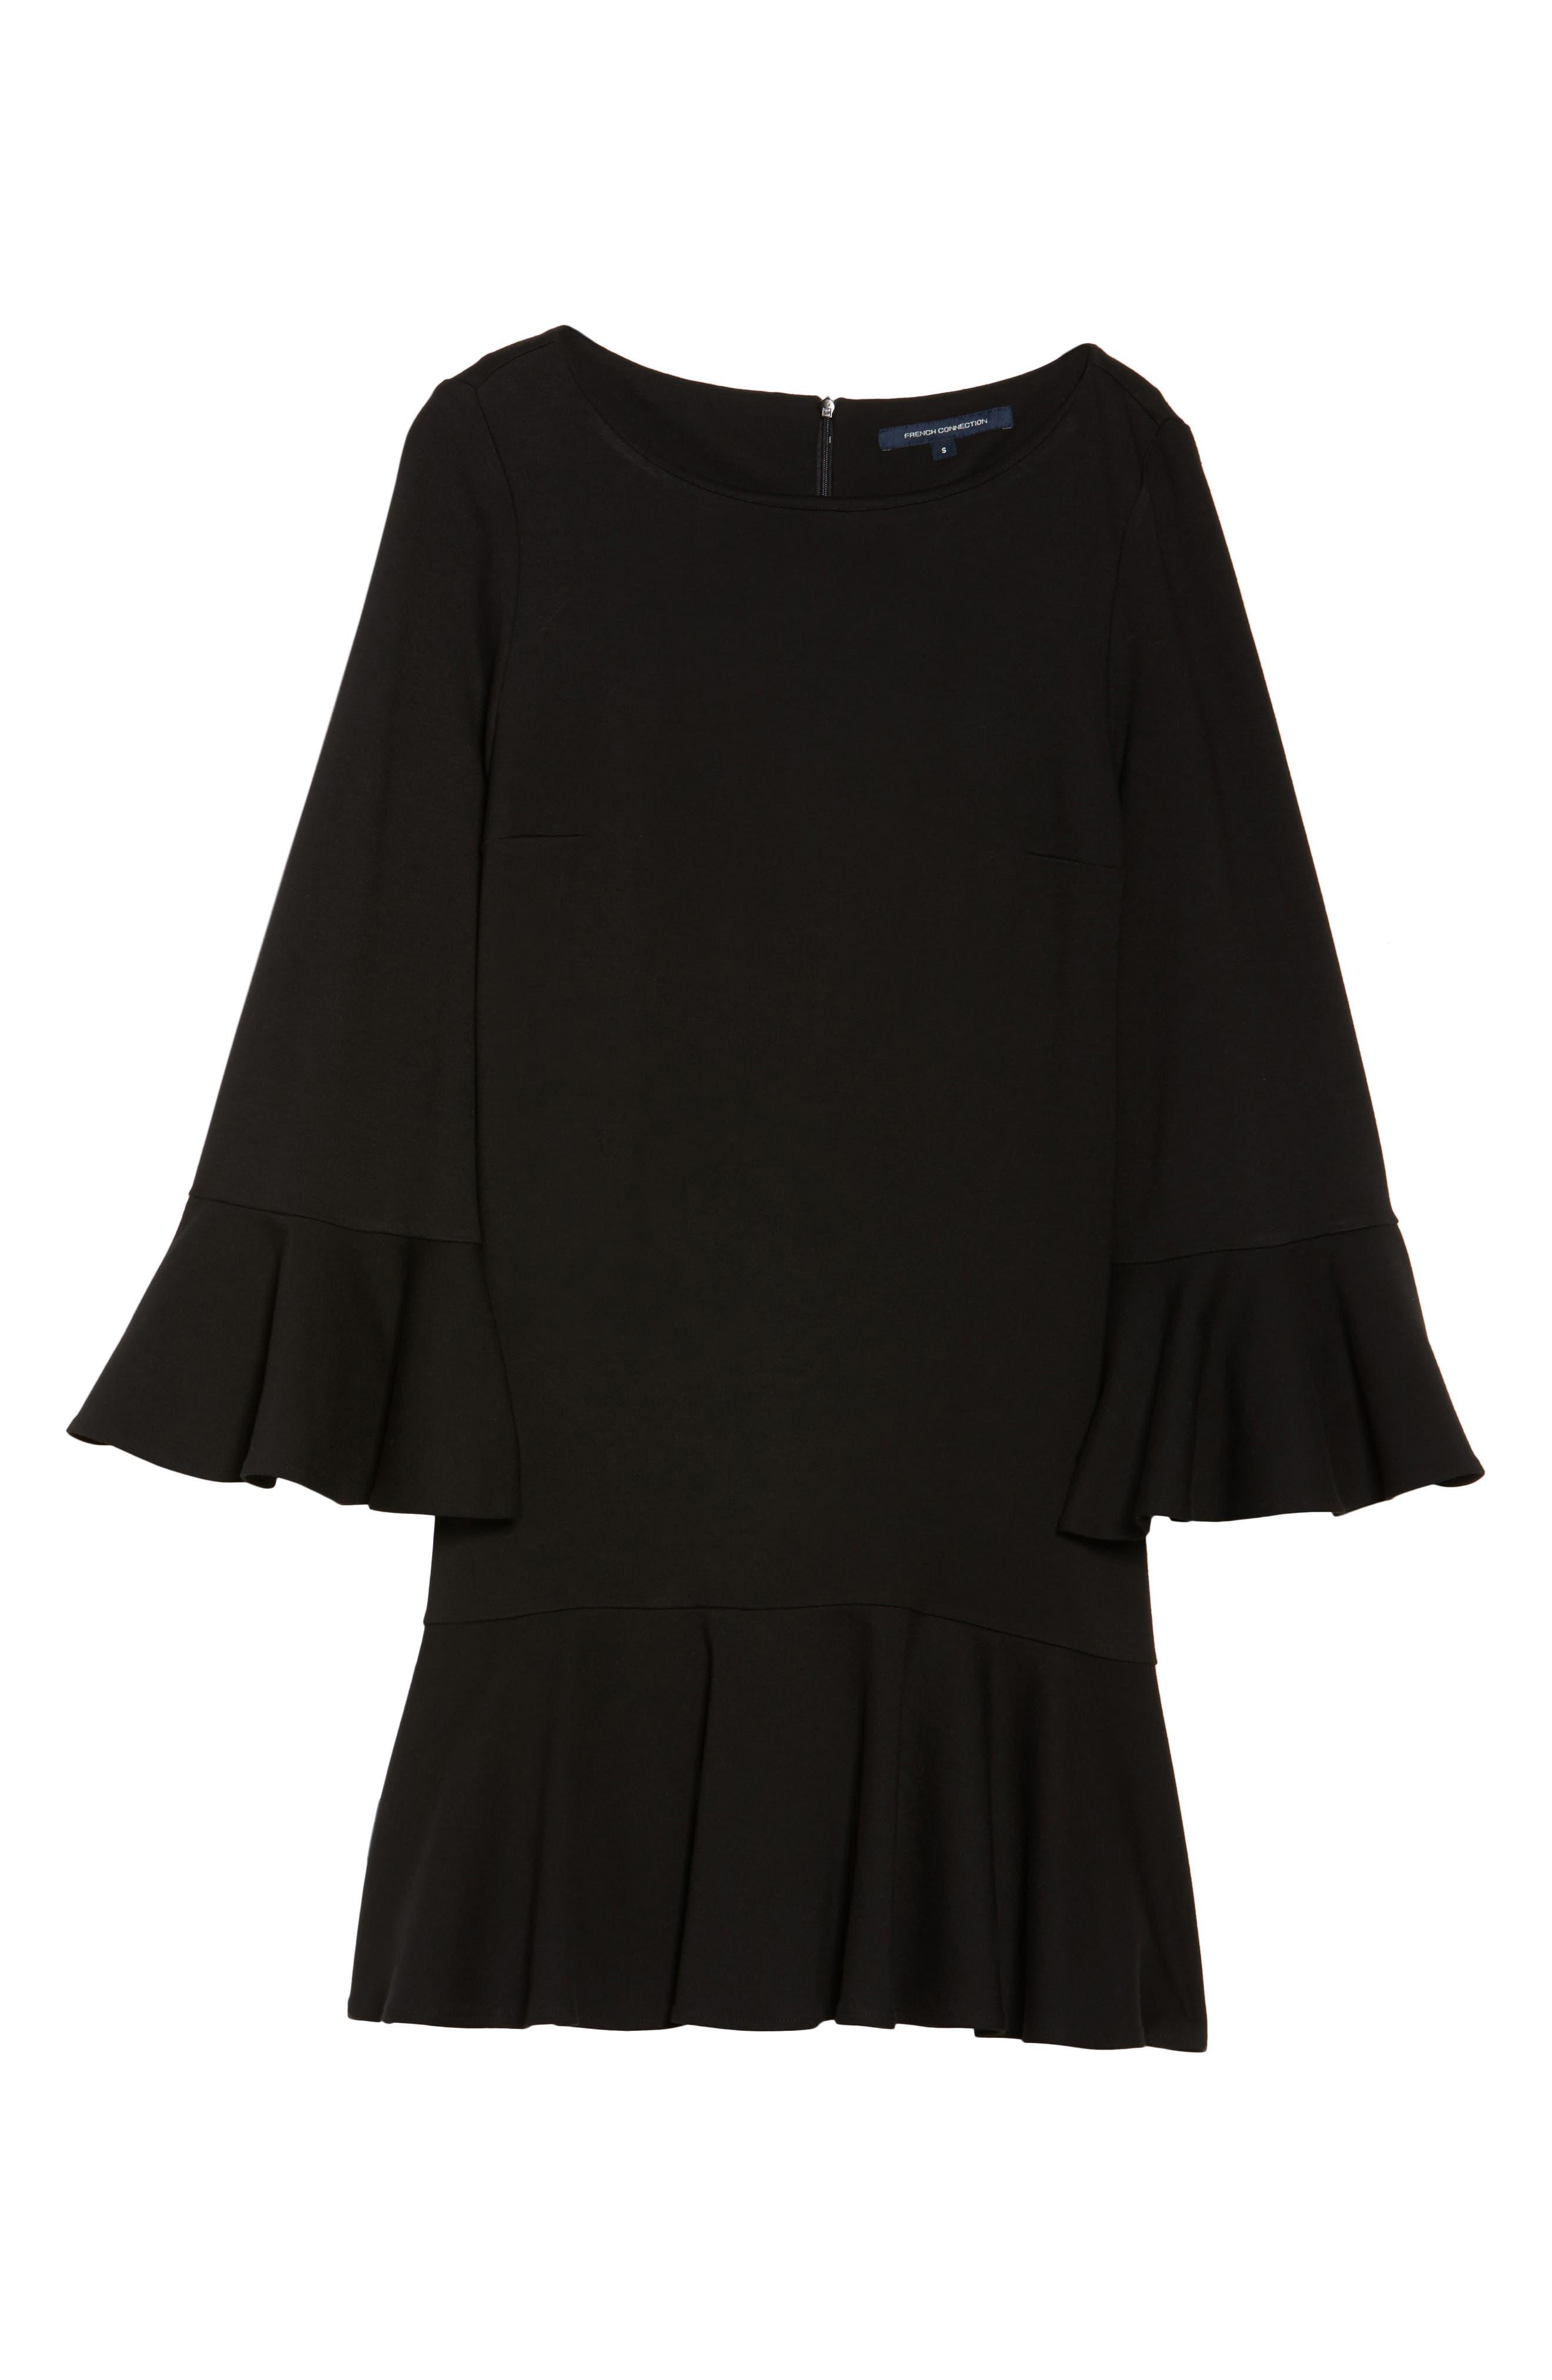 Matuku Lula Bell Sleeve Dress,                             Alternate thumbnail 6, color,                             001